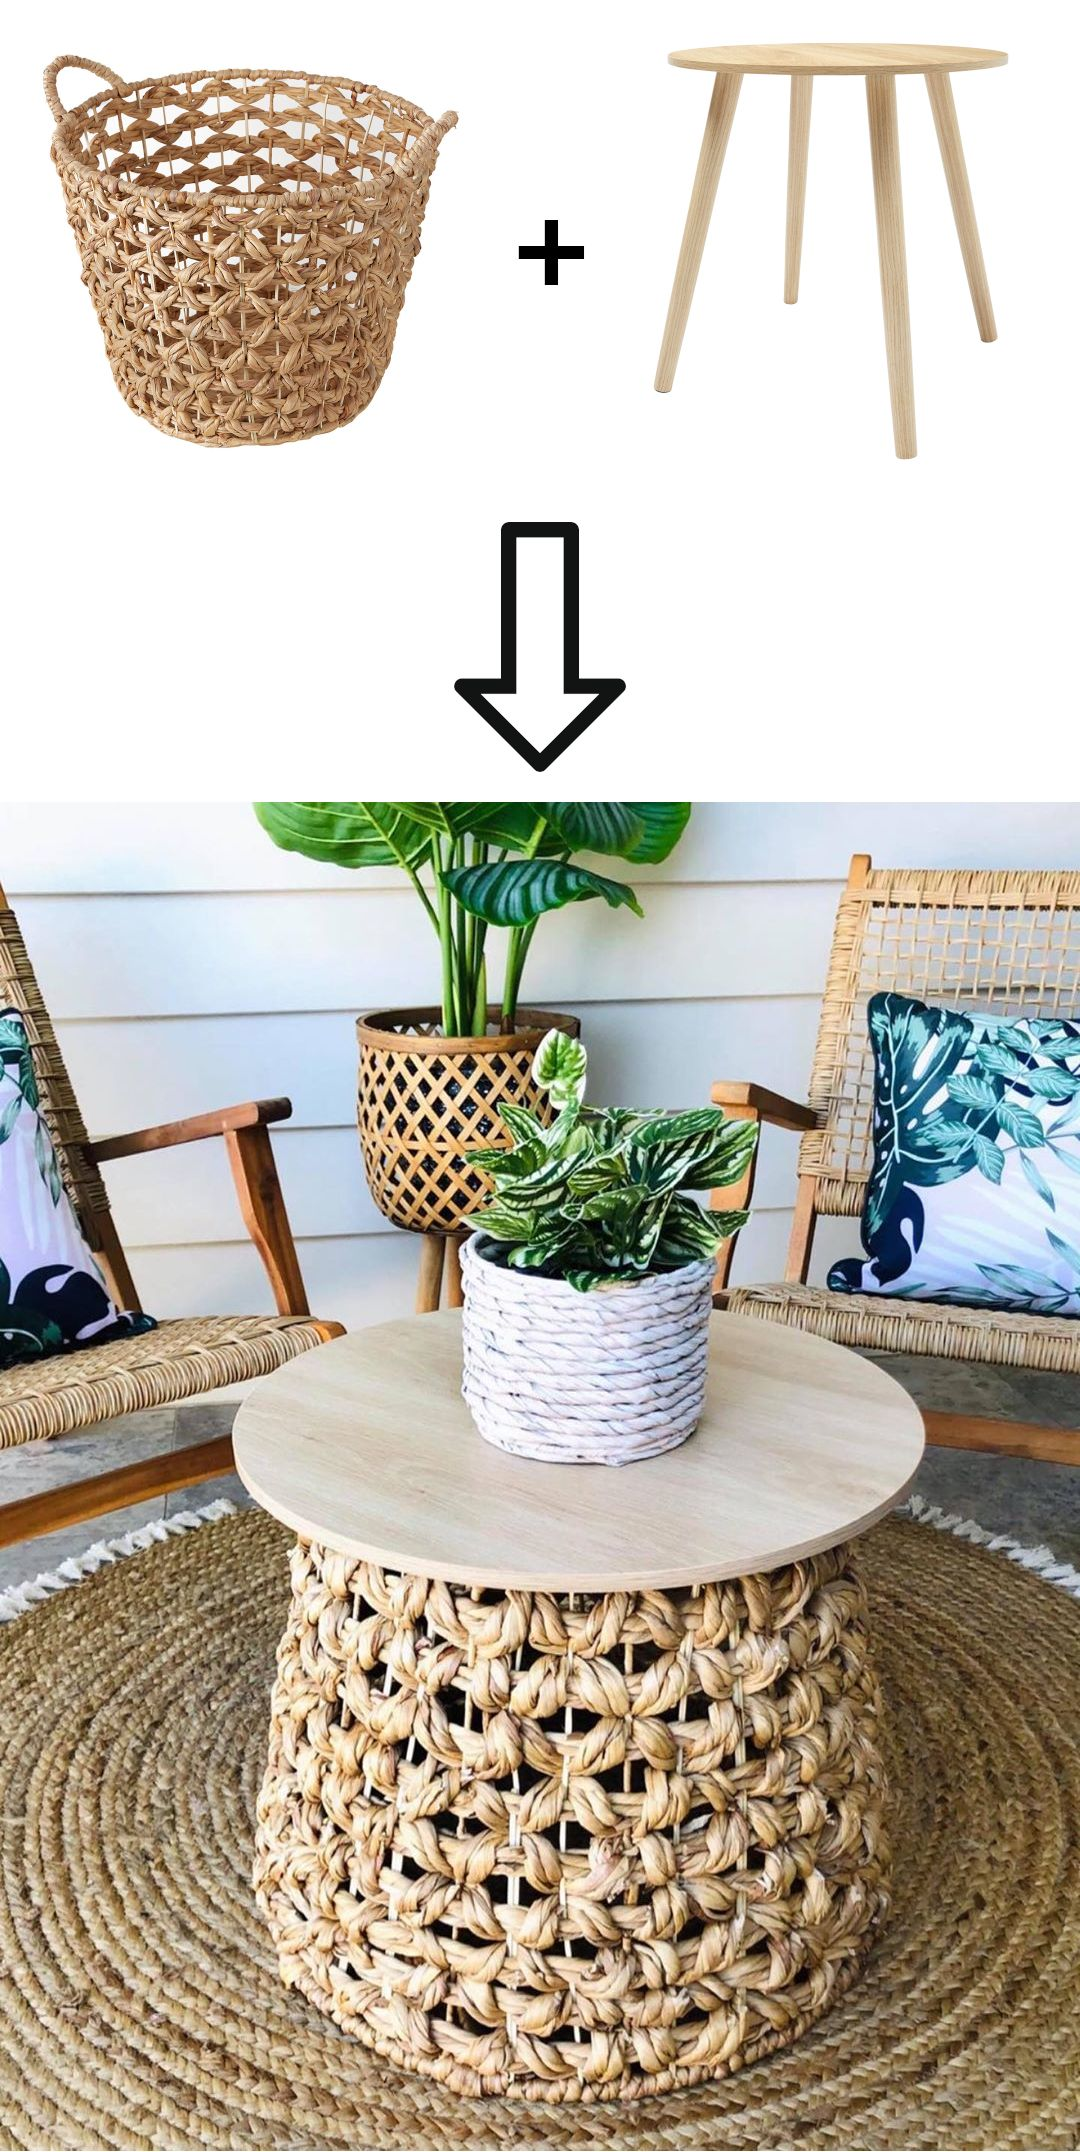 Kmart Hack Woven Basket Coffee Table Home Decor Australia Accent Table Decor Diy Boho Decor [ 2152 x 1080 Pixel ]